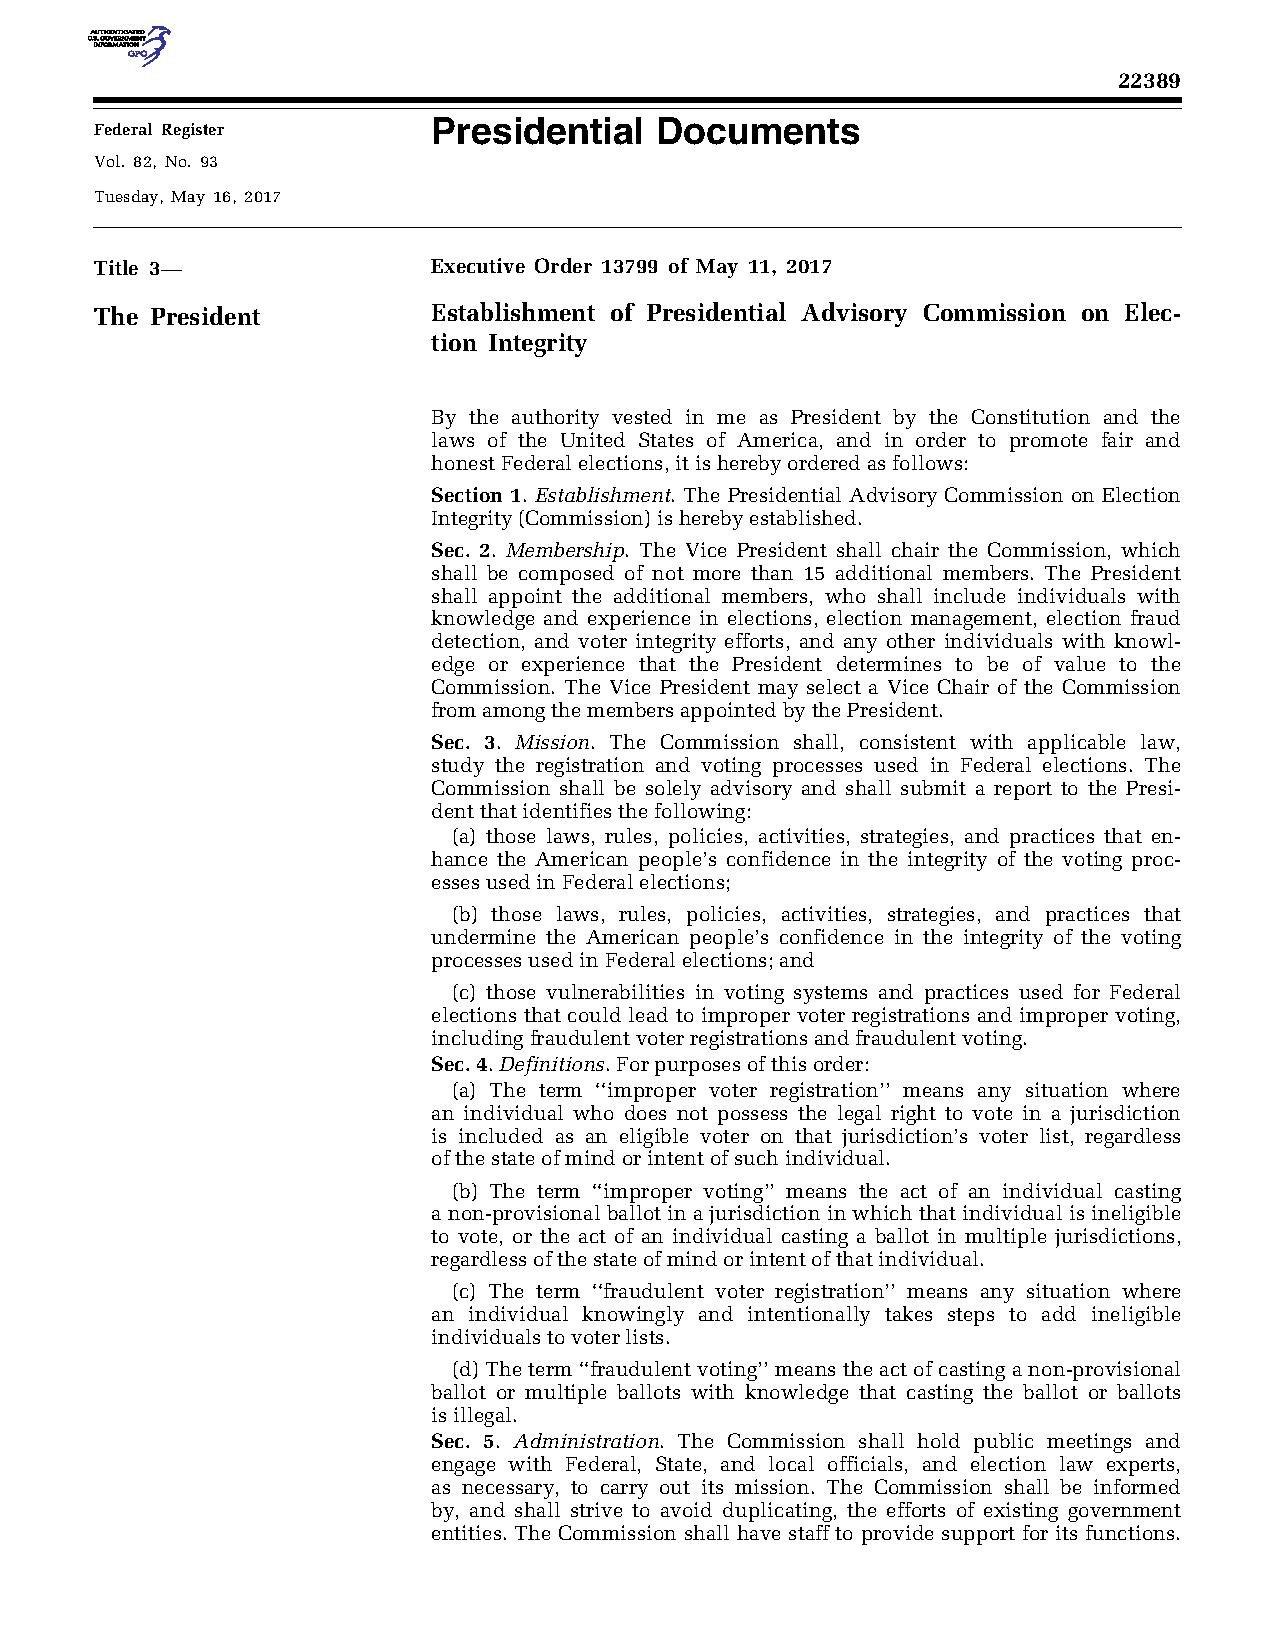 Executive order (United States) - Wikipedia